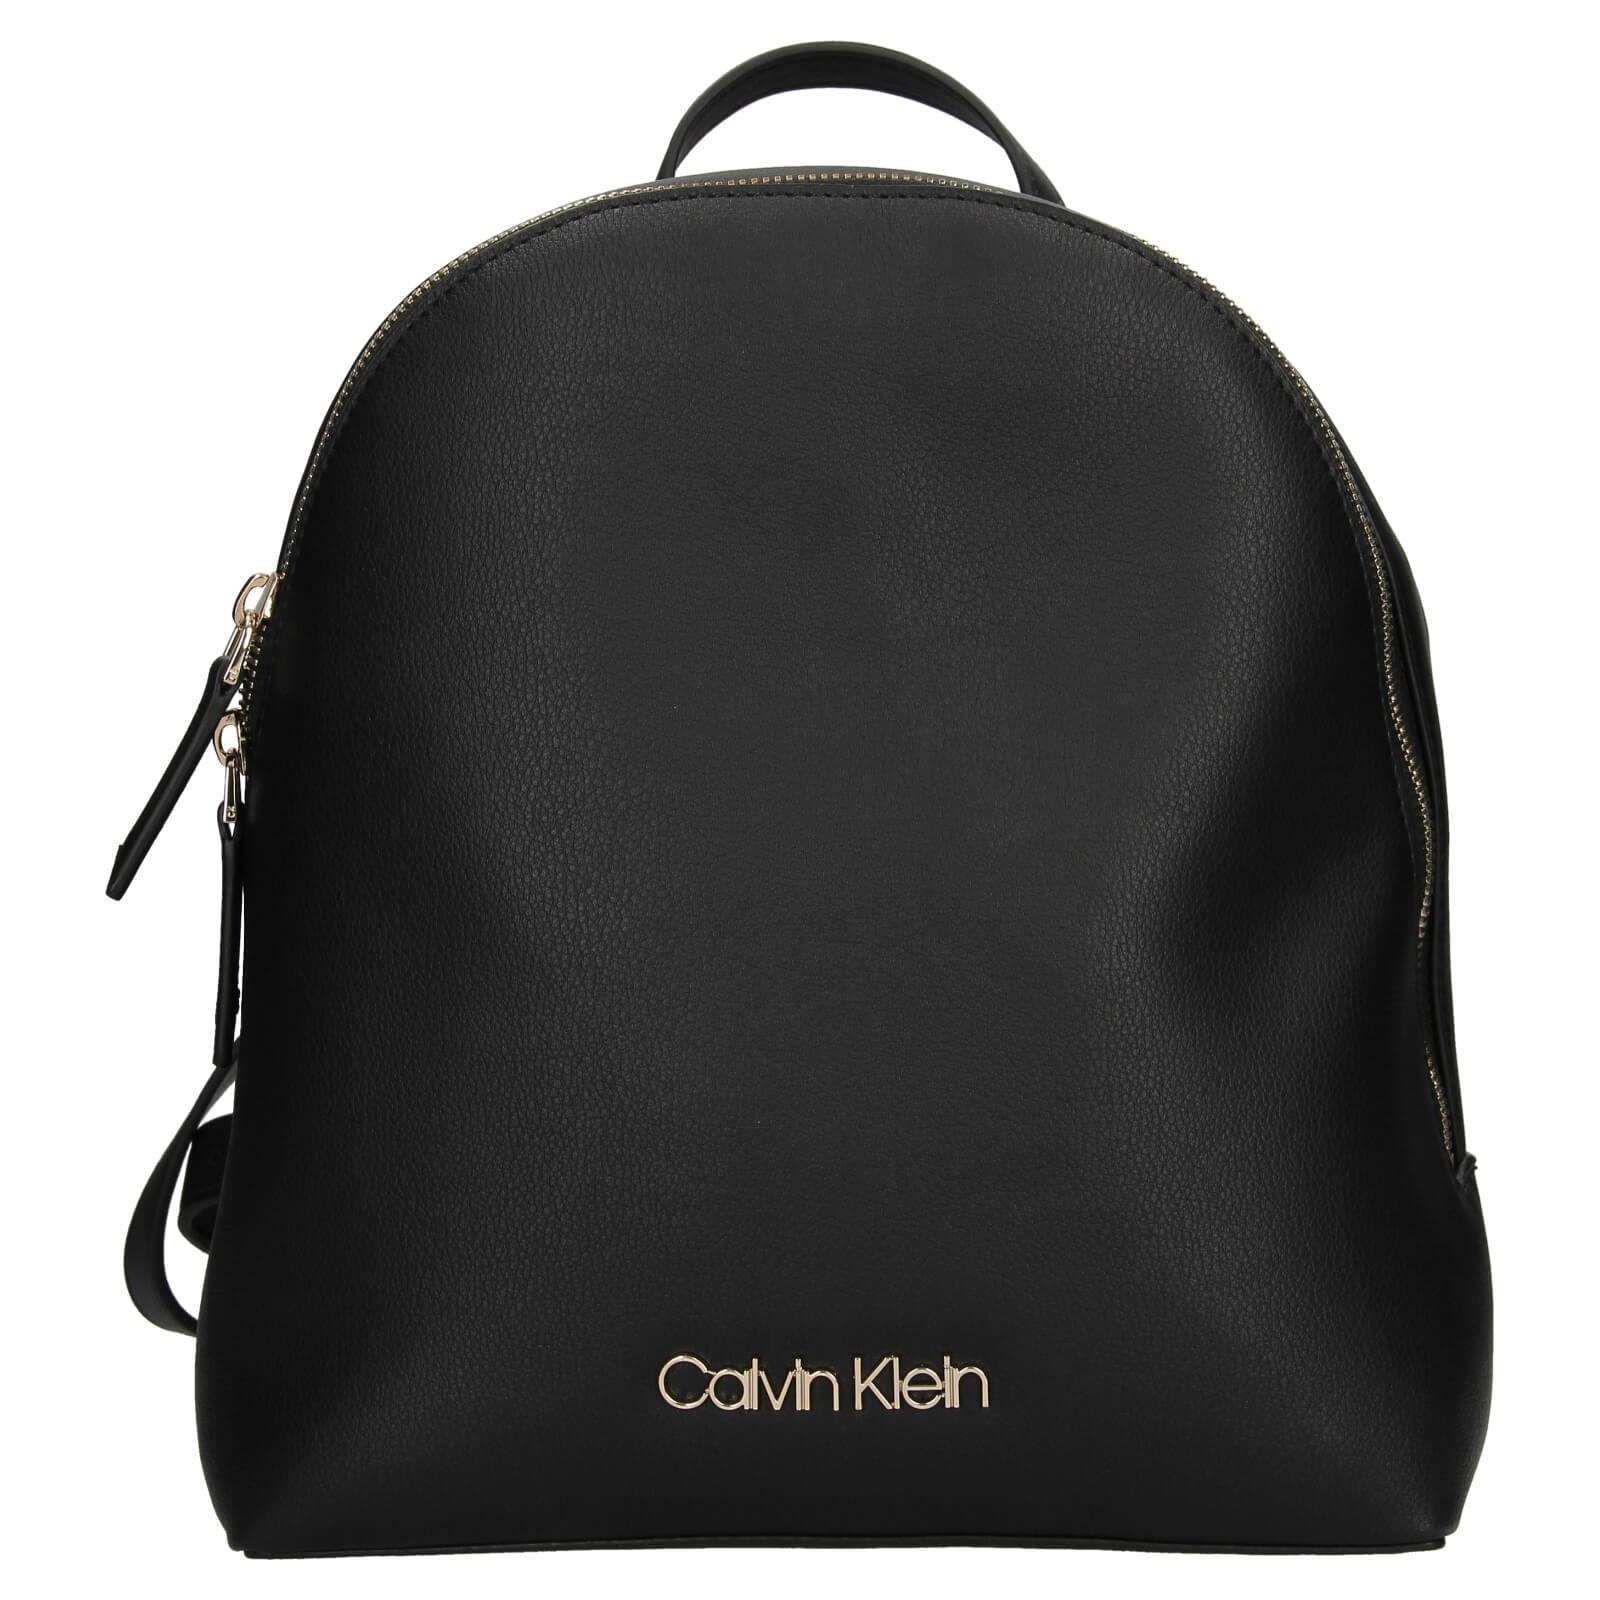 Dámsky batoh Calvin Klein Valoa - čierna